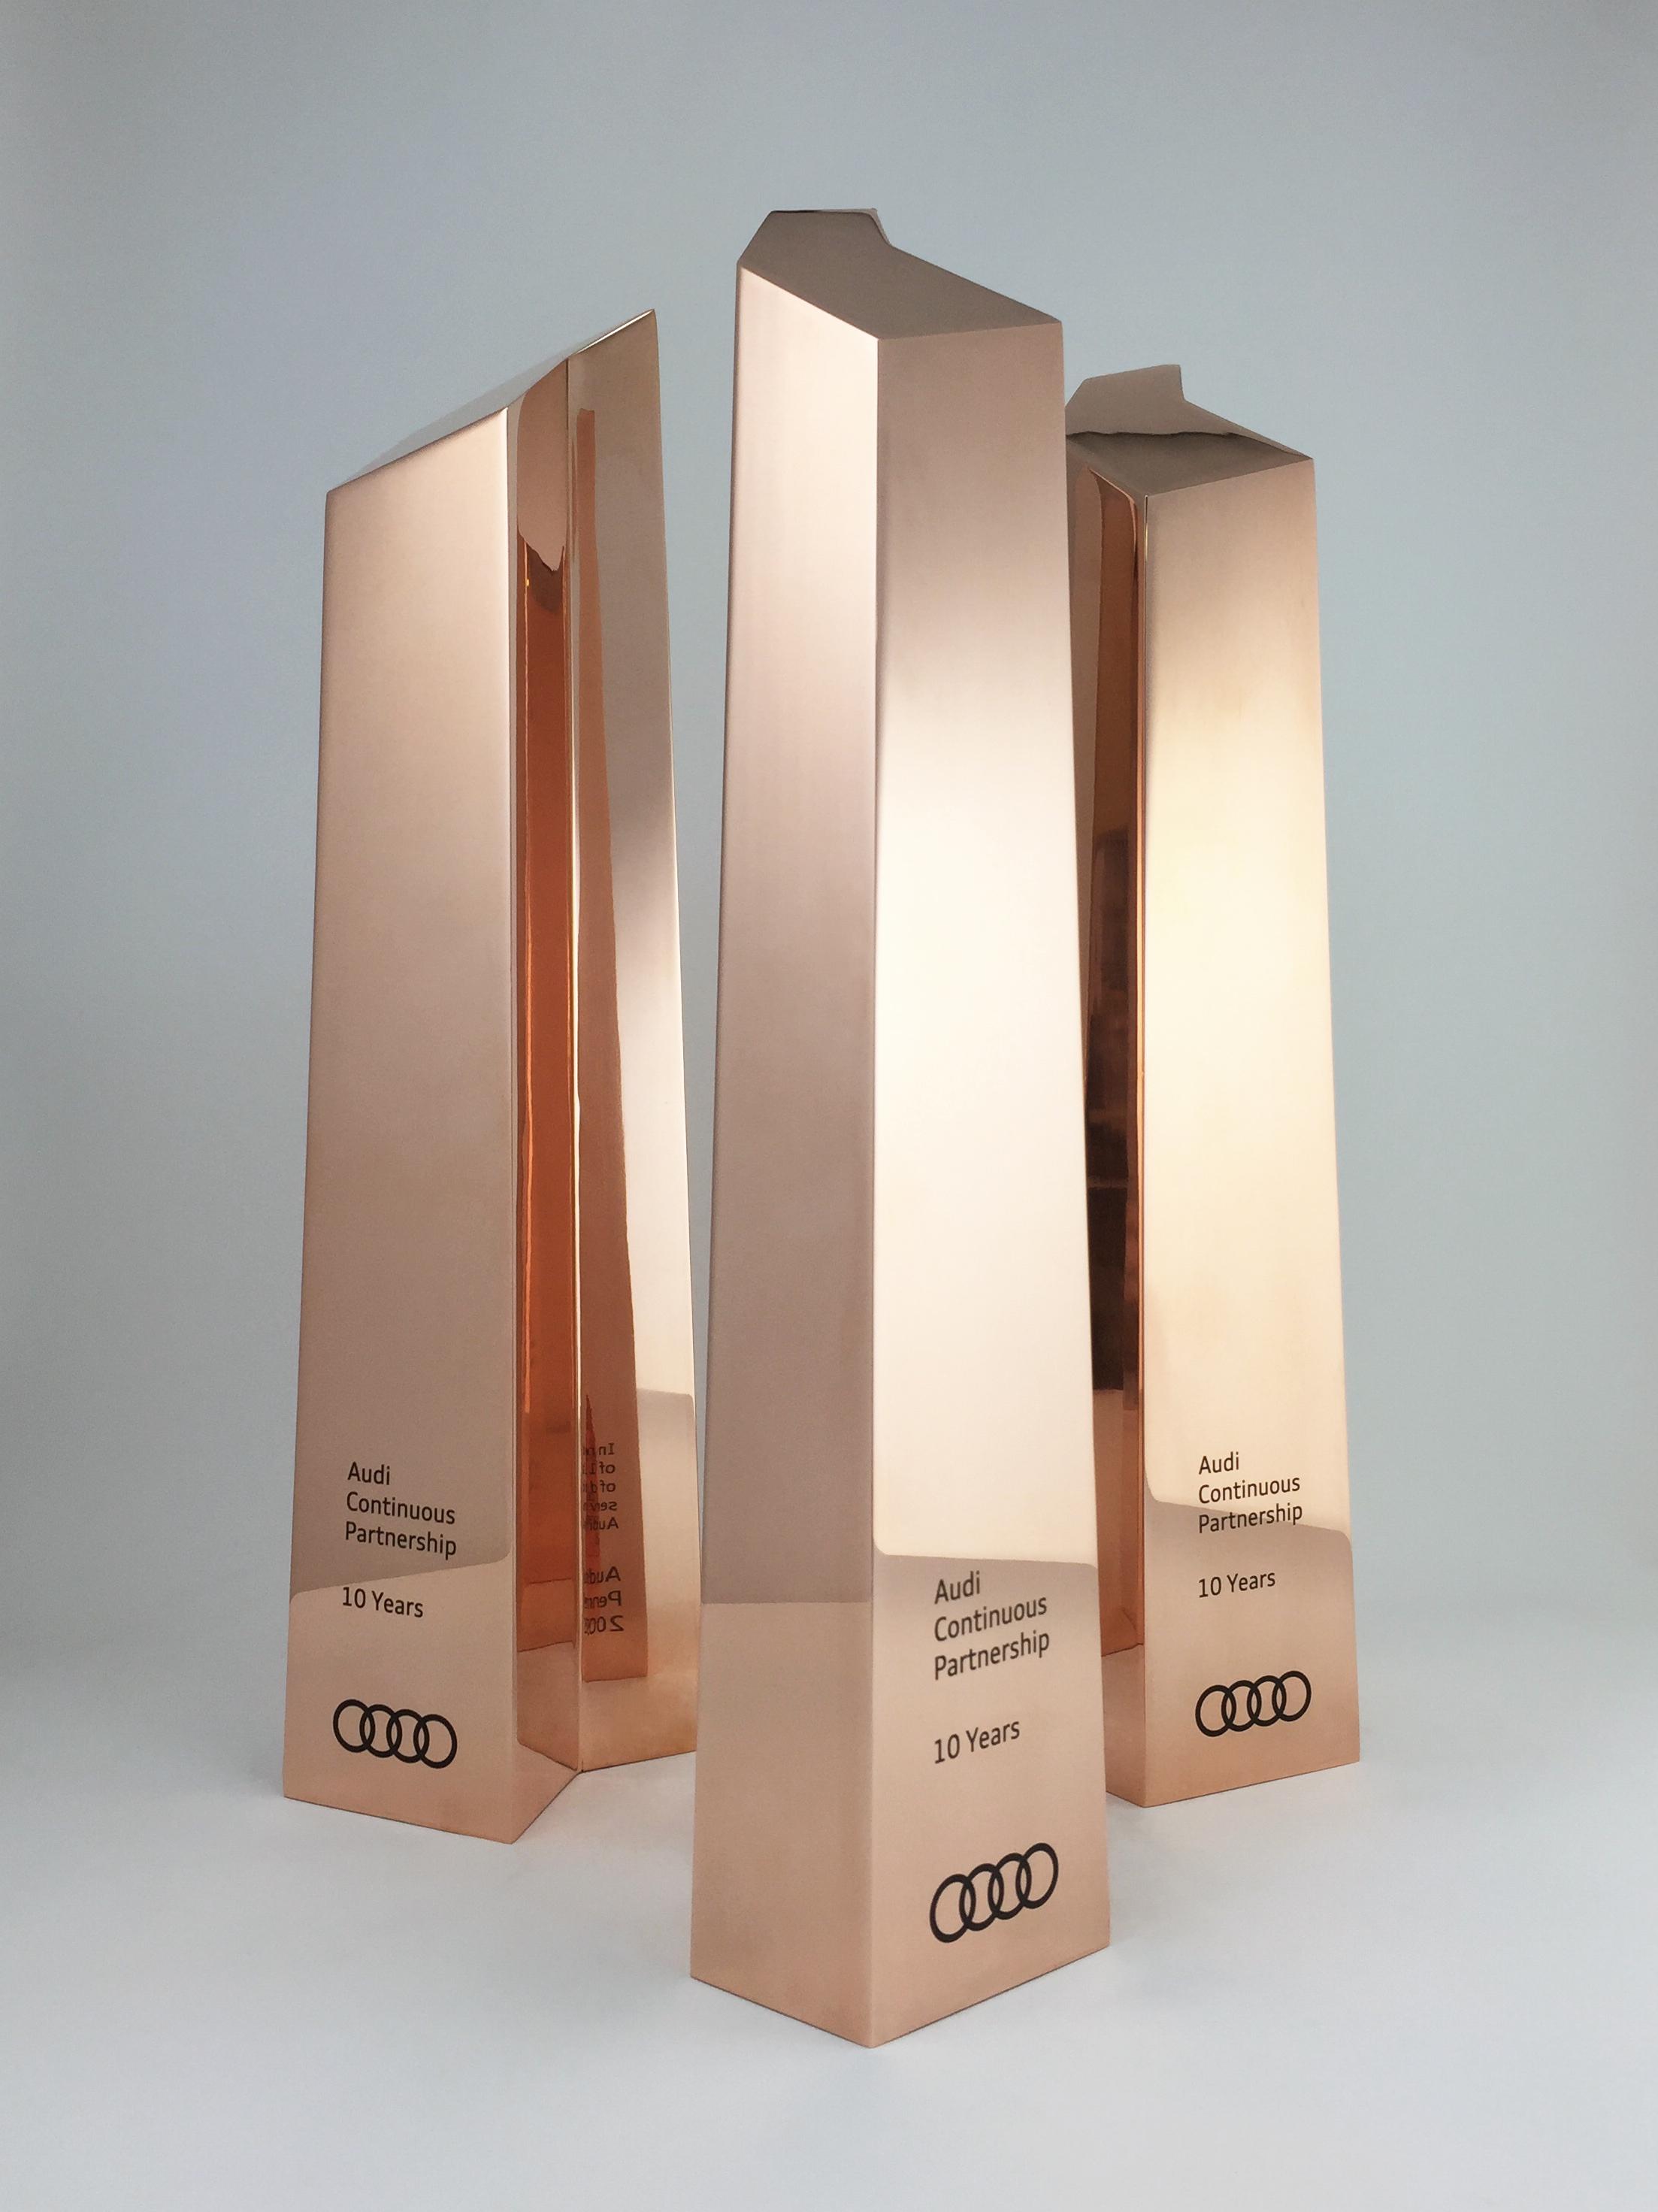 audi-metal-art-sculpture-award-trophy-06.jpg